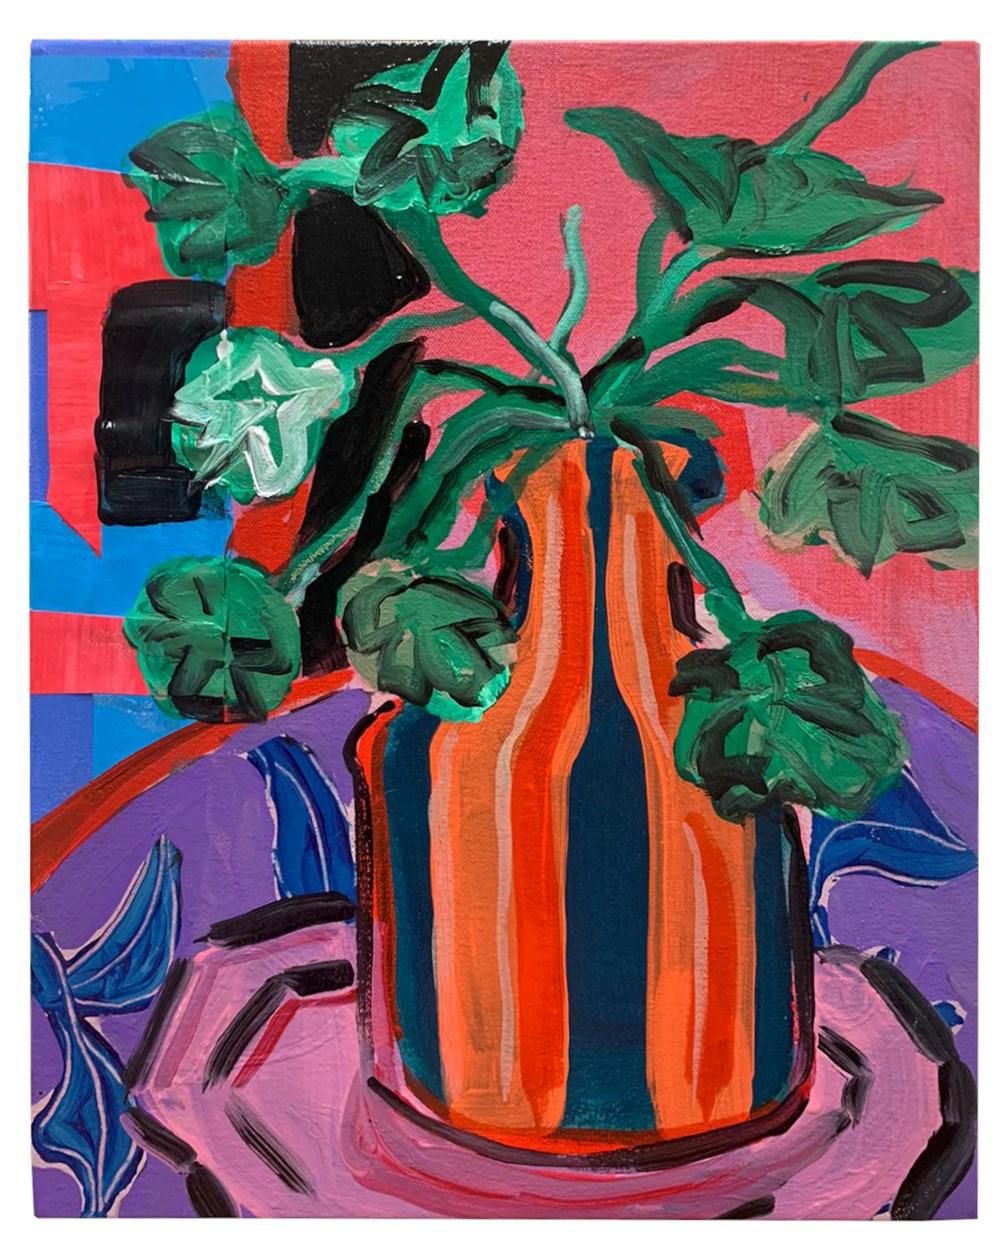 50 x £50 - Lot 10, Rose Electra Harris, Orange Vase on pink plate